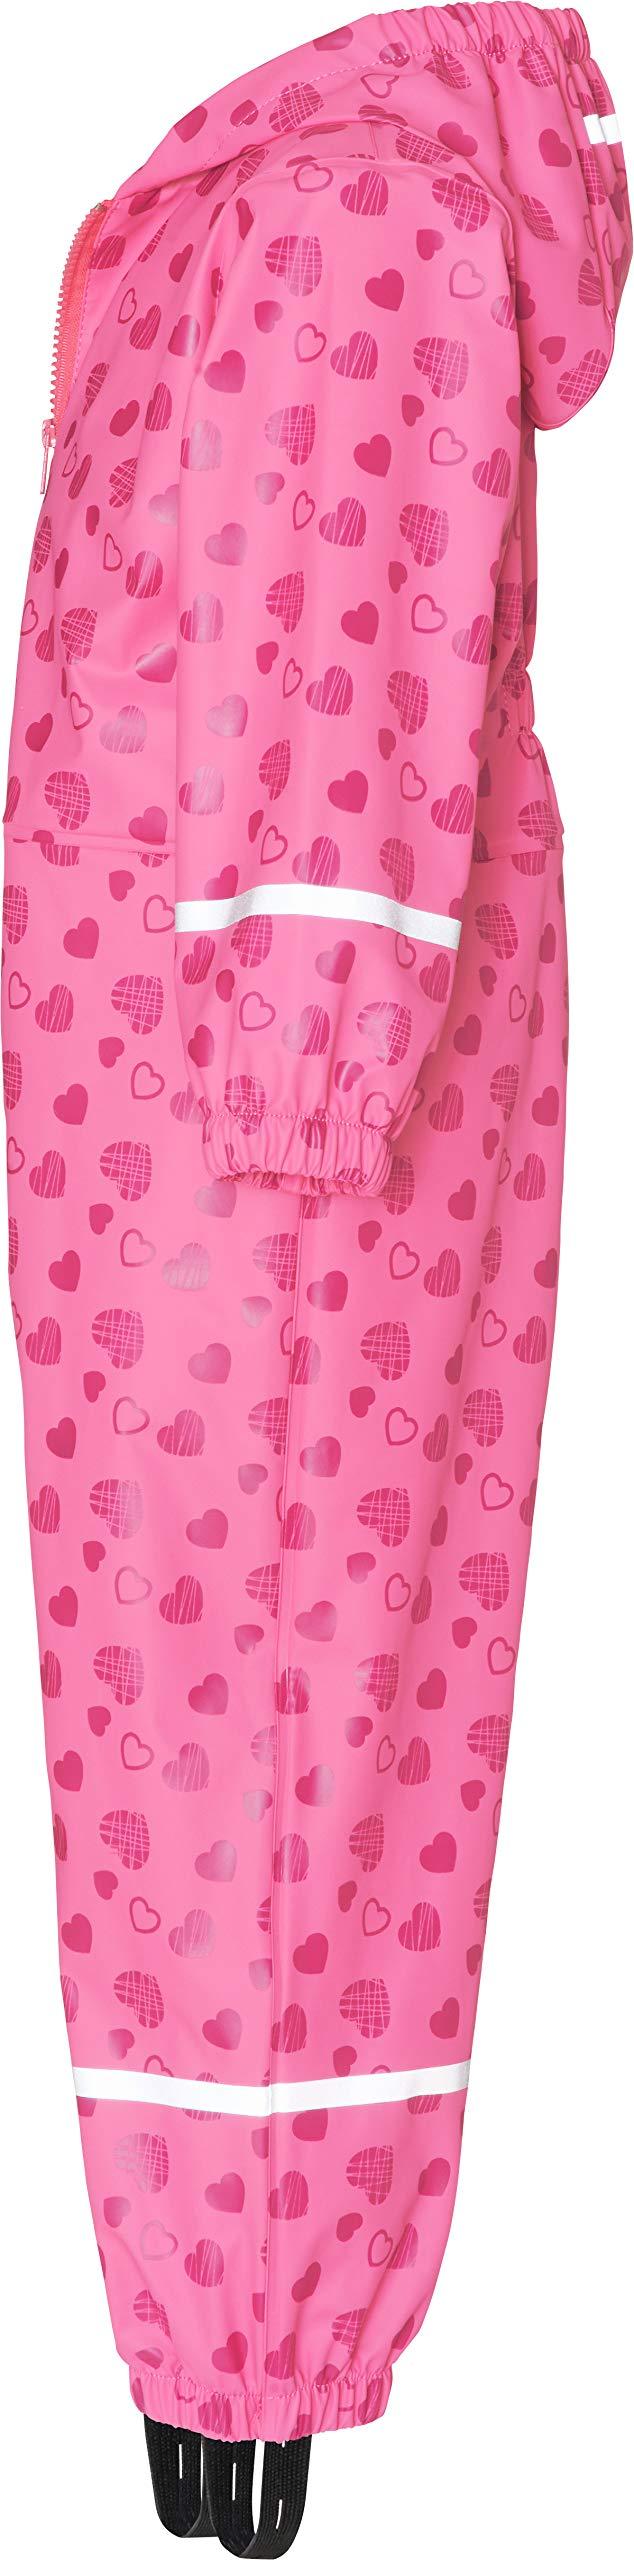 Playshoes Regen-Overall Herzchen Allover Pantalones Impermeable para Bebés 3